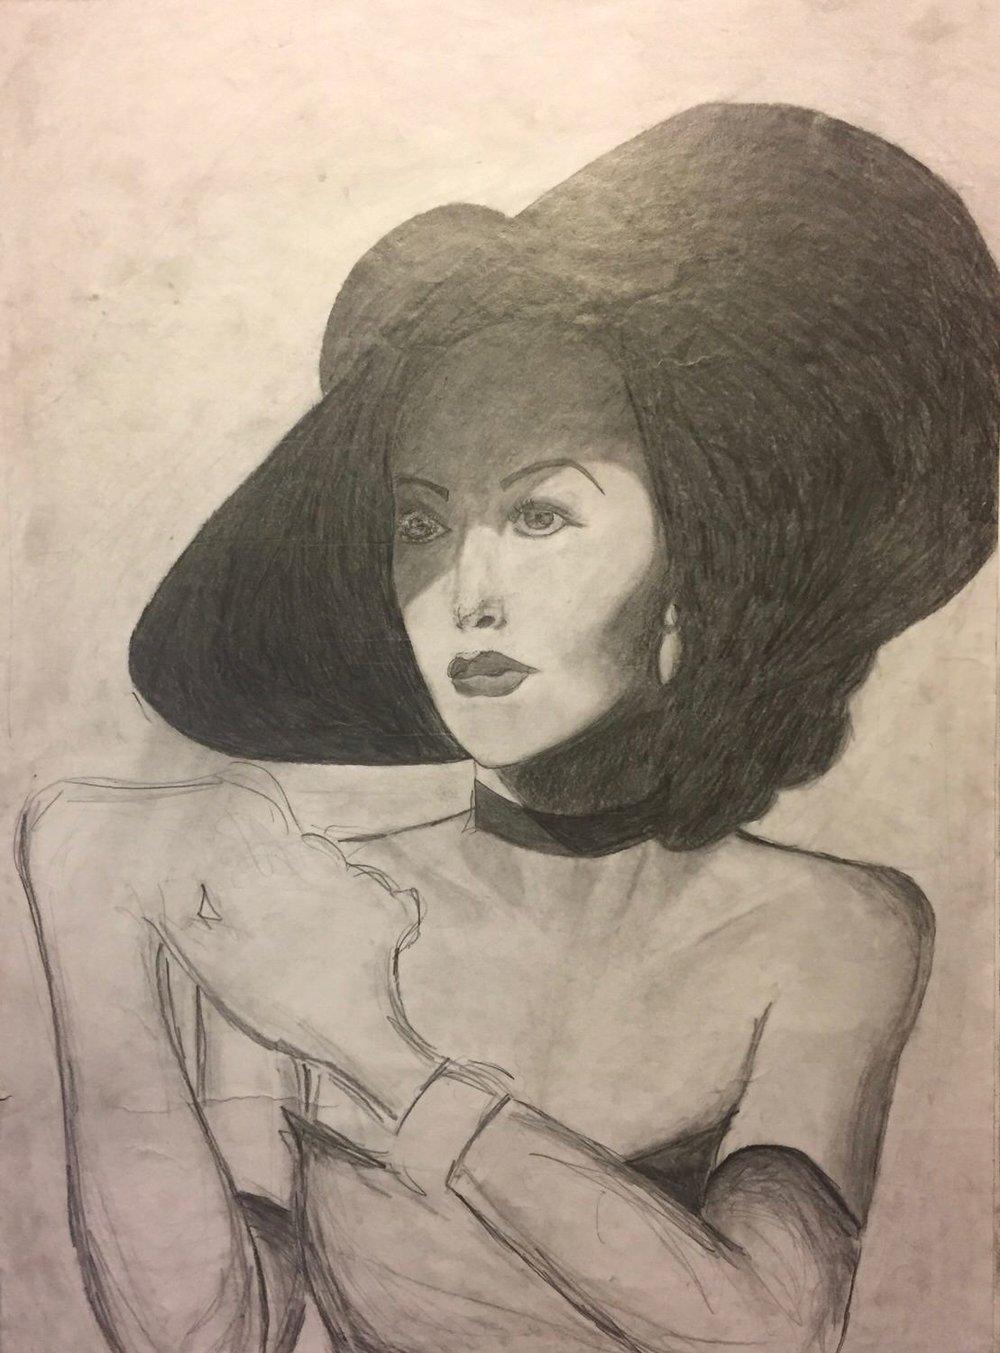 2012.??.?? - Characters (Hedy Lamar).jpg